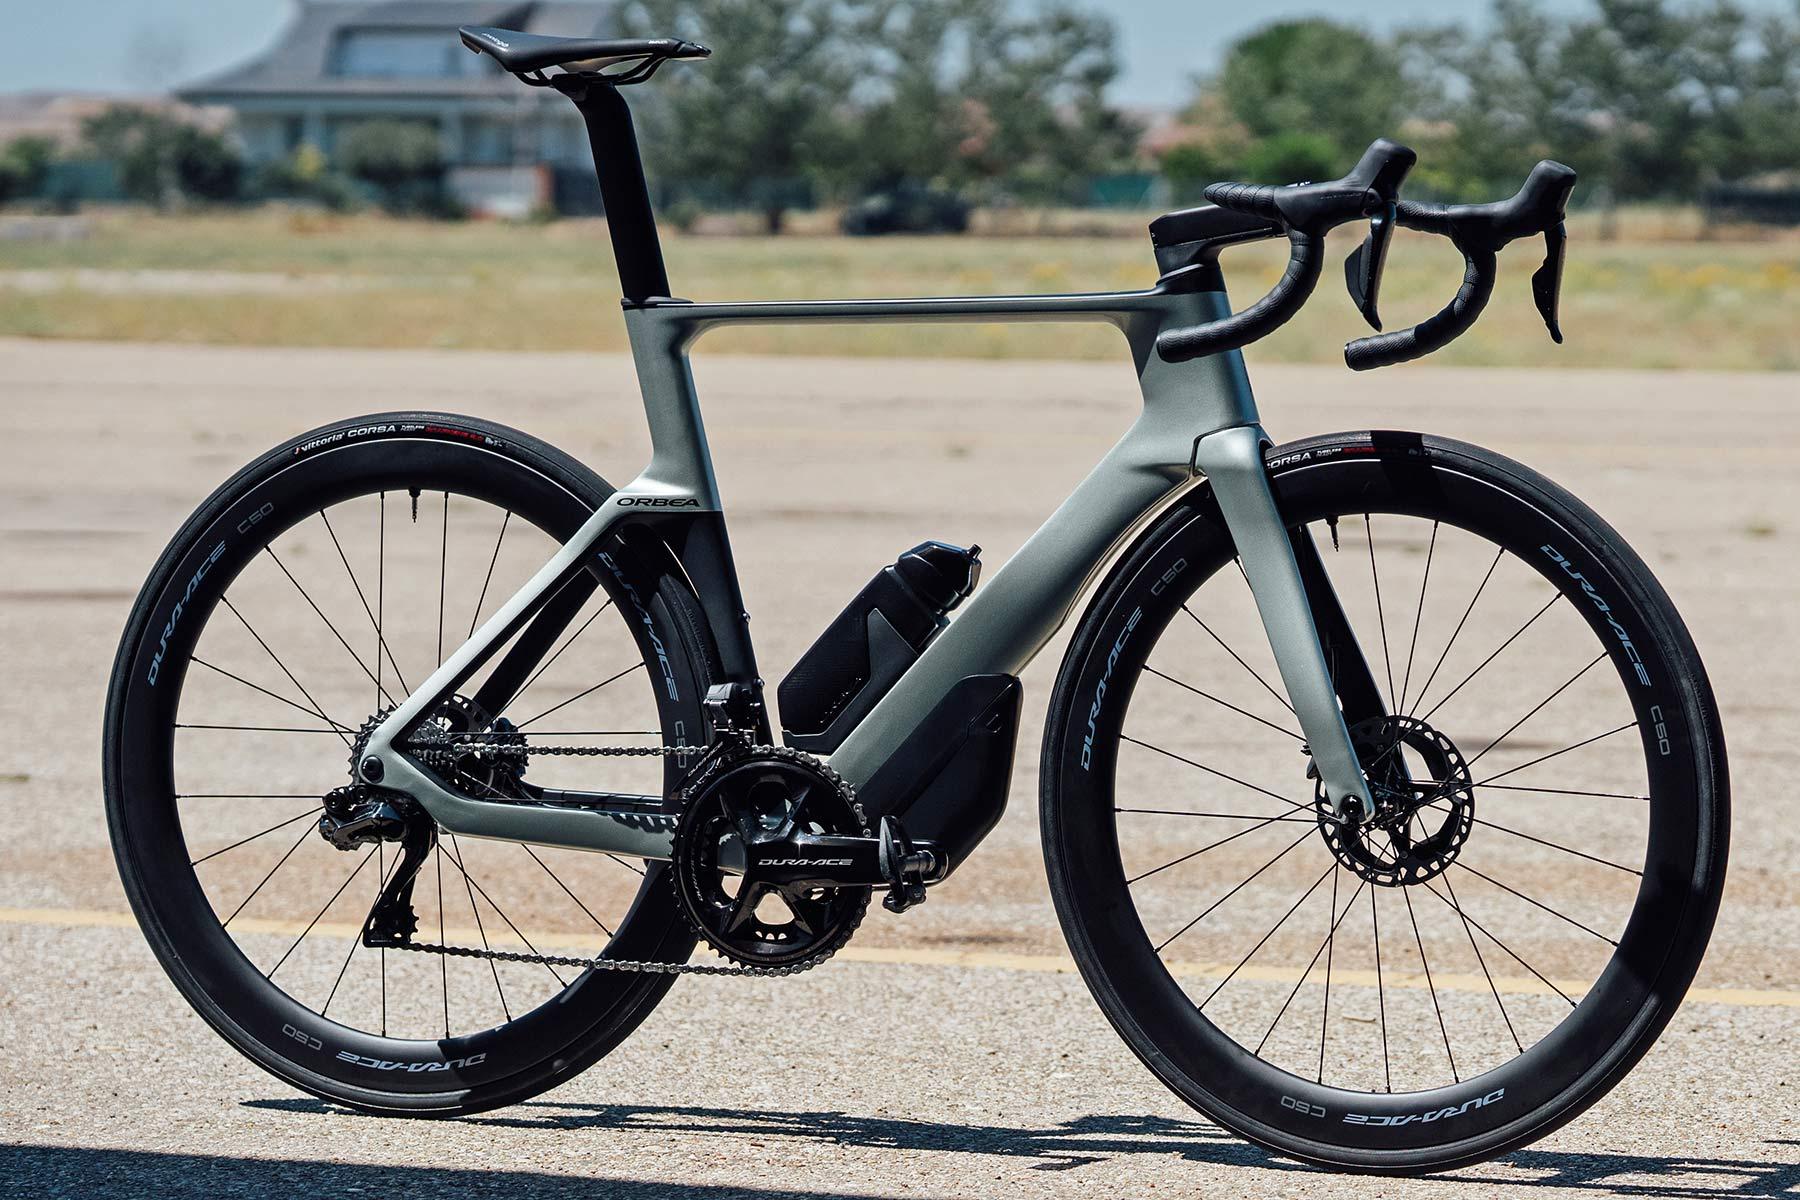 2022 Orbea Orca Aero carbon road bike, complete